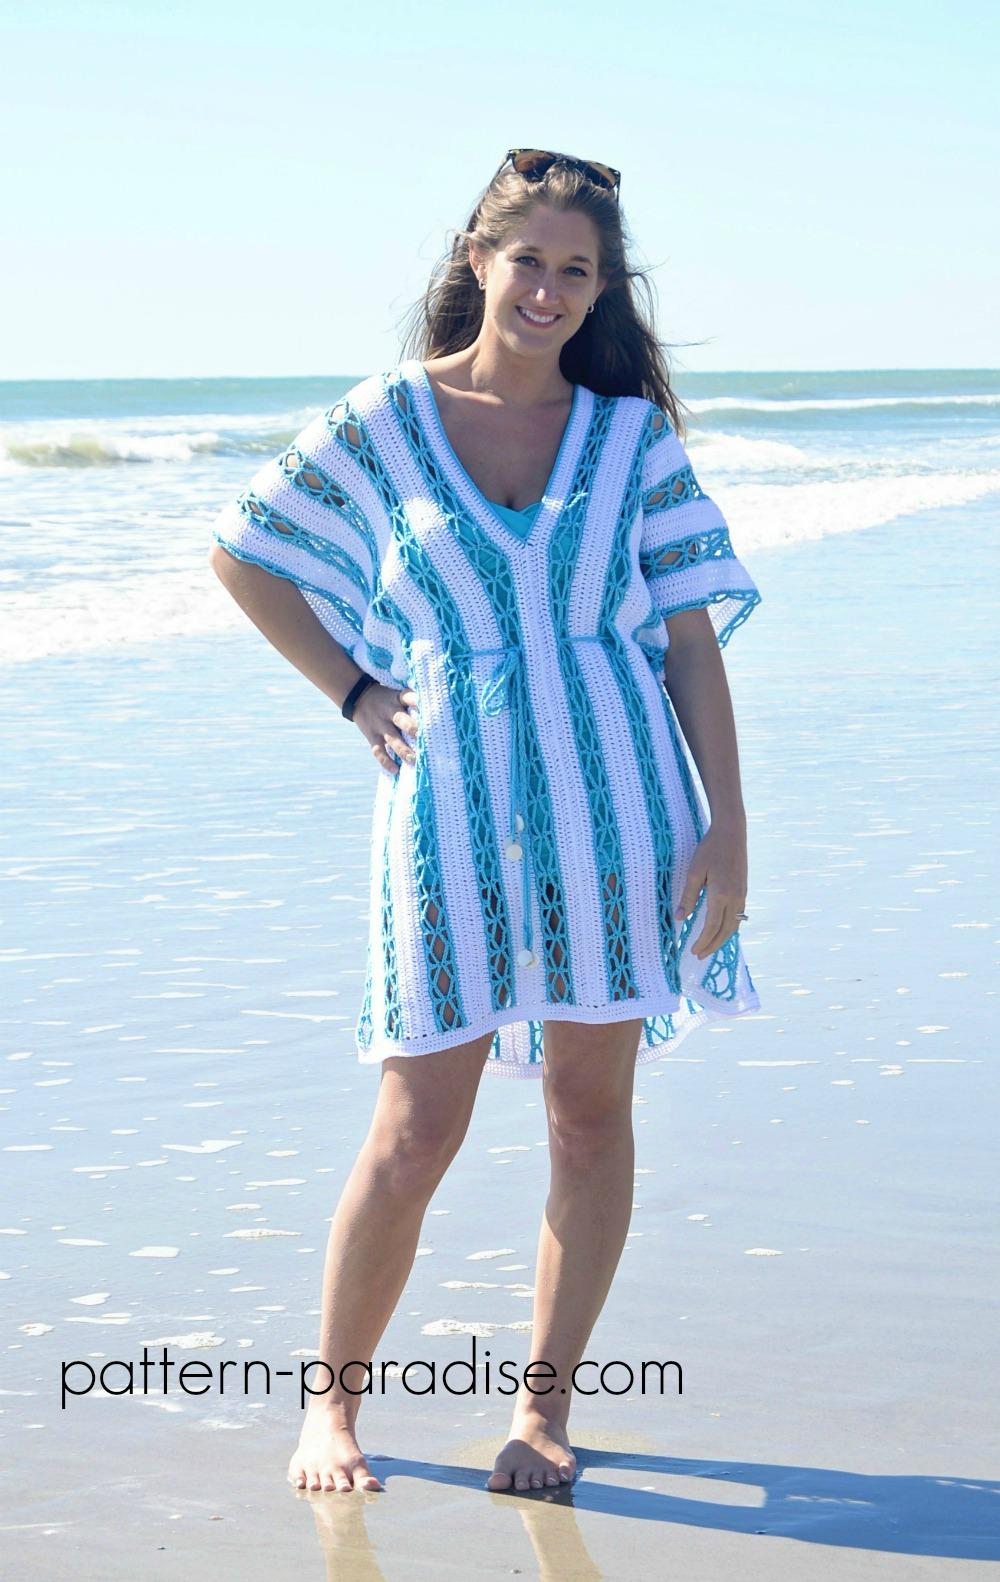 CelebrateMomCAL – Beach Day Cover-Up Tunic | Pattern Paradise